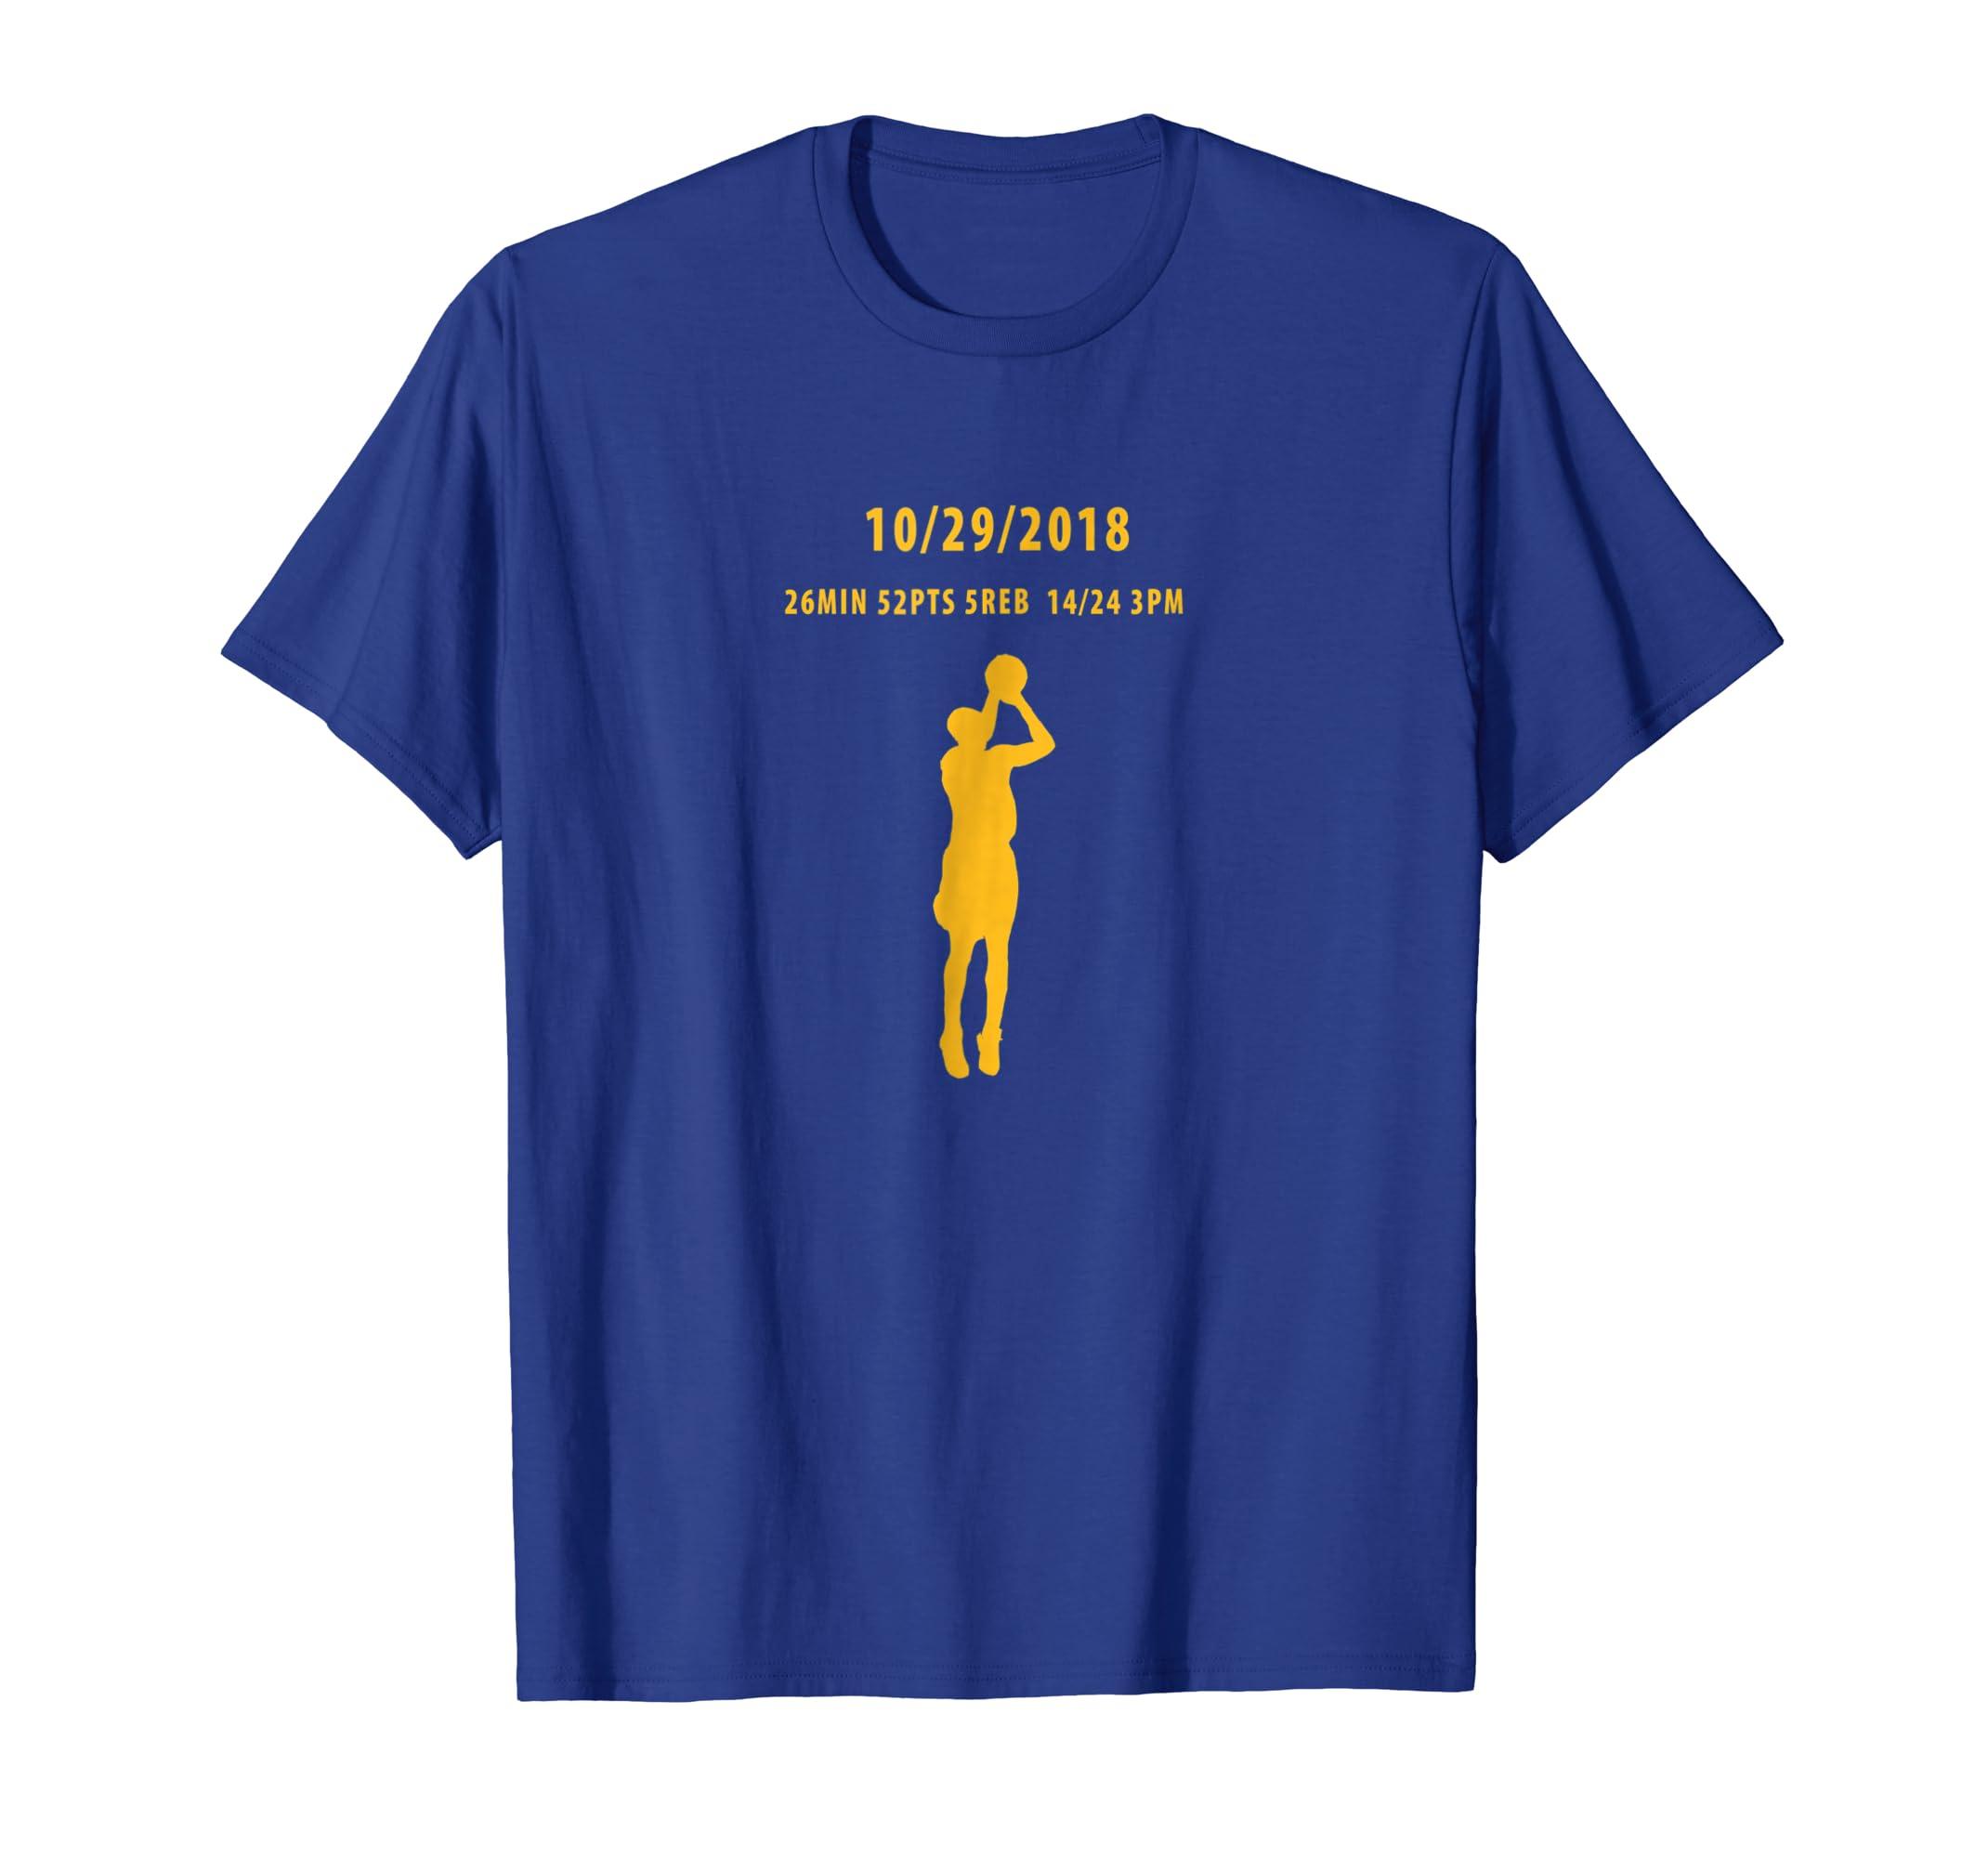 Basketball California Shirt History Moment Three Pointers-SFL